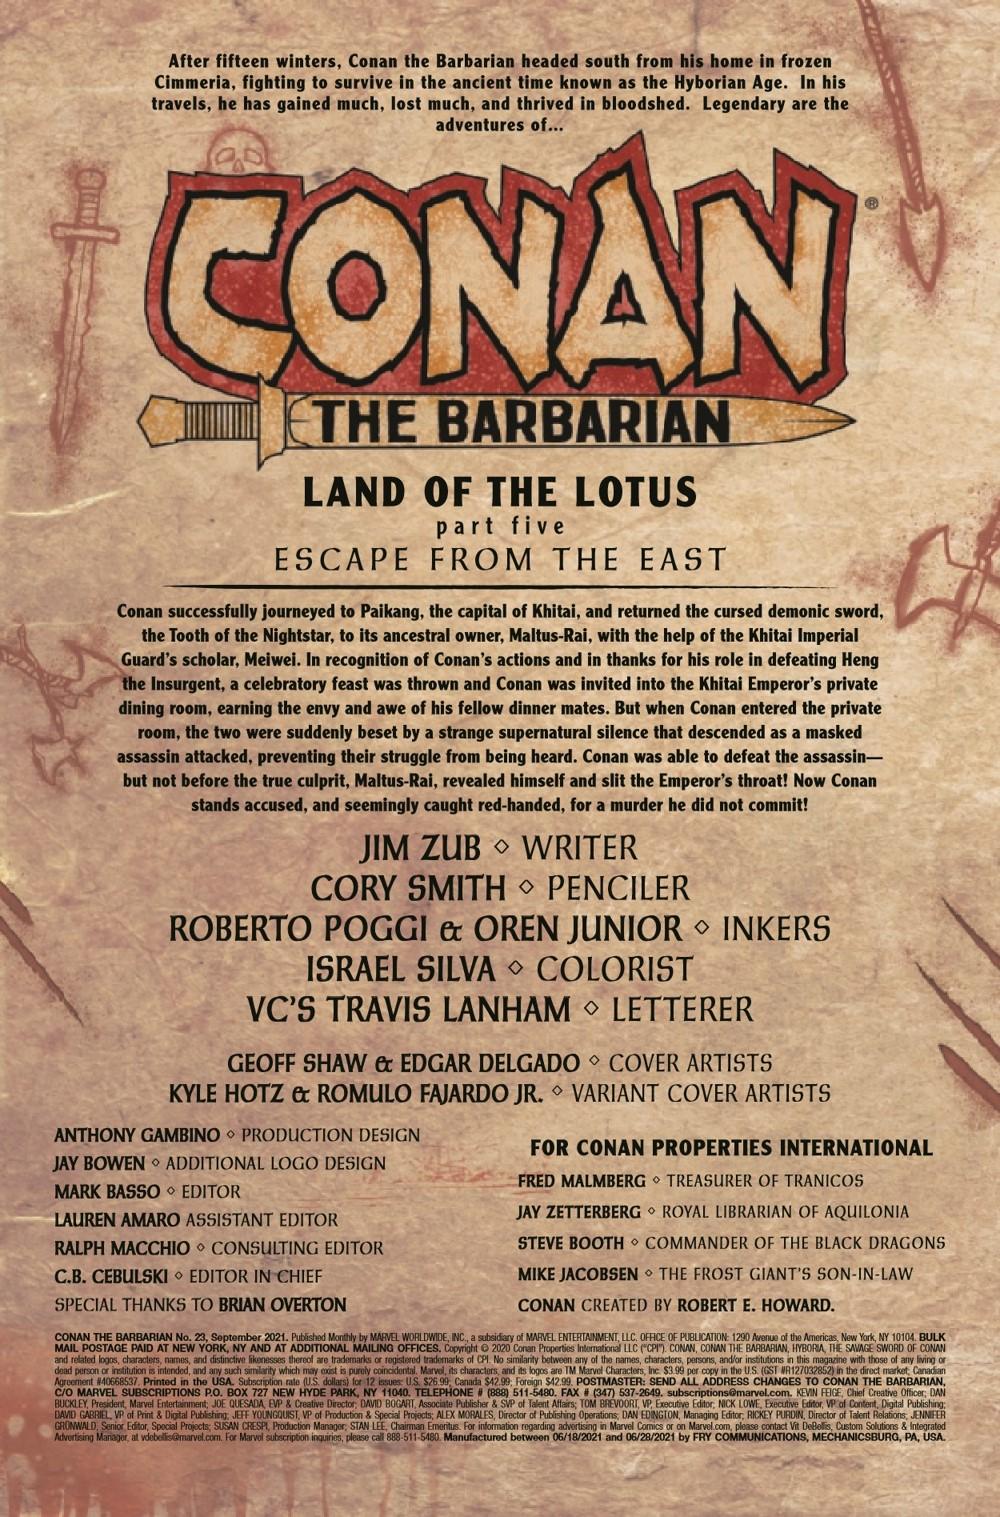 CONANBARB2019023_Preview-2 ComicList Previews: CONAN THE BARBARIAN #23